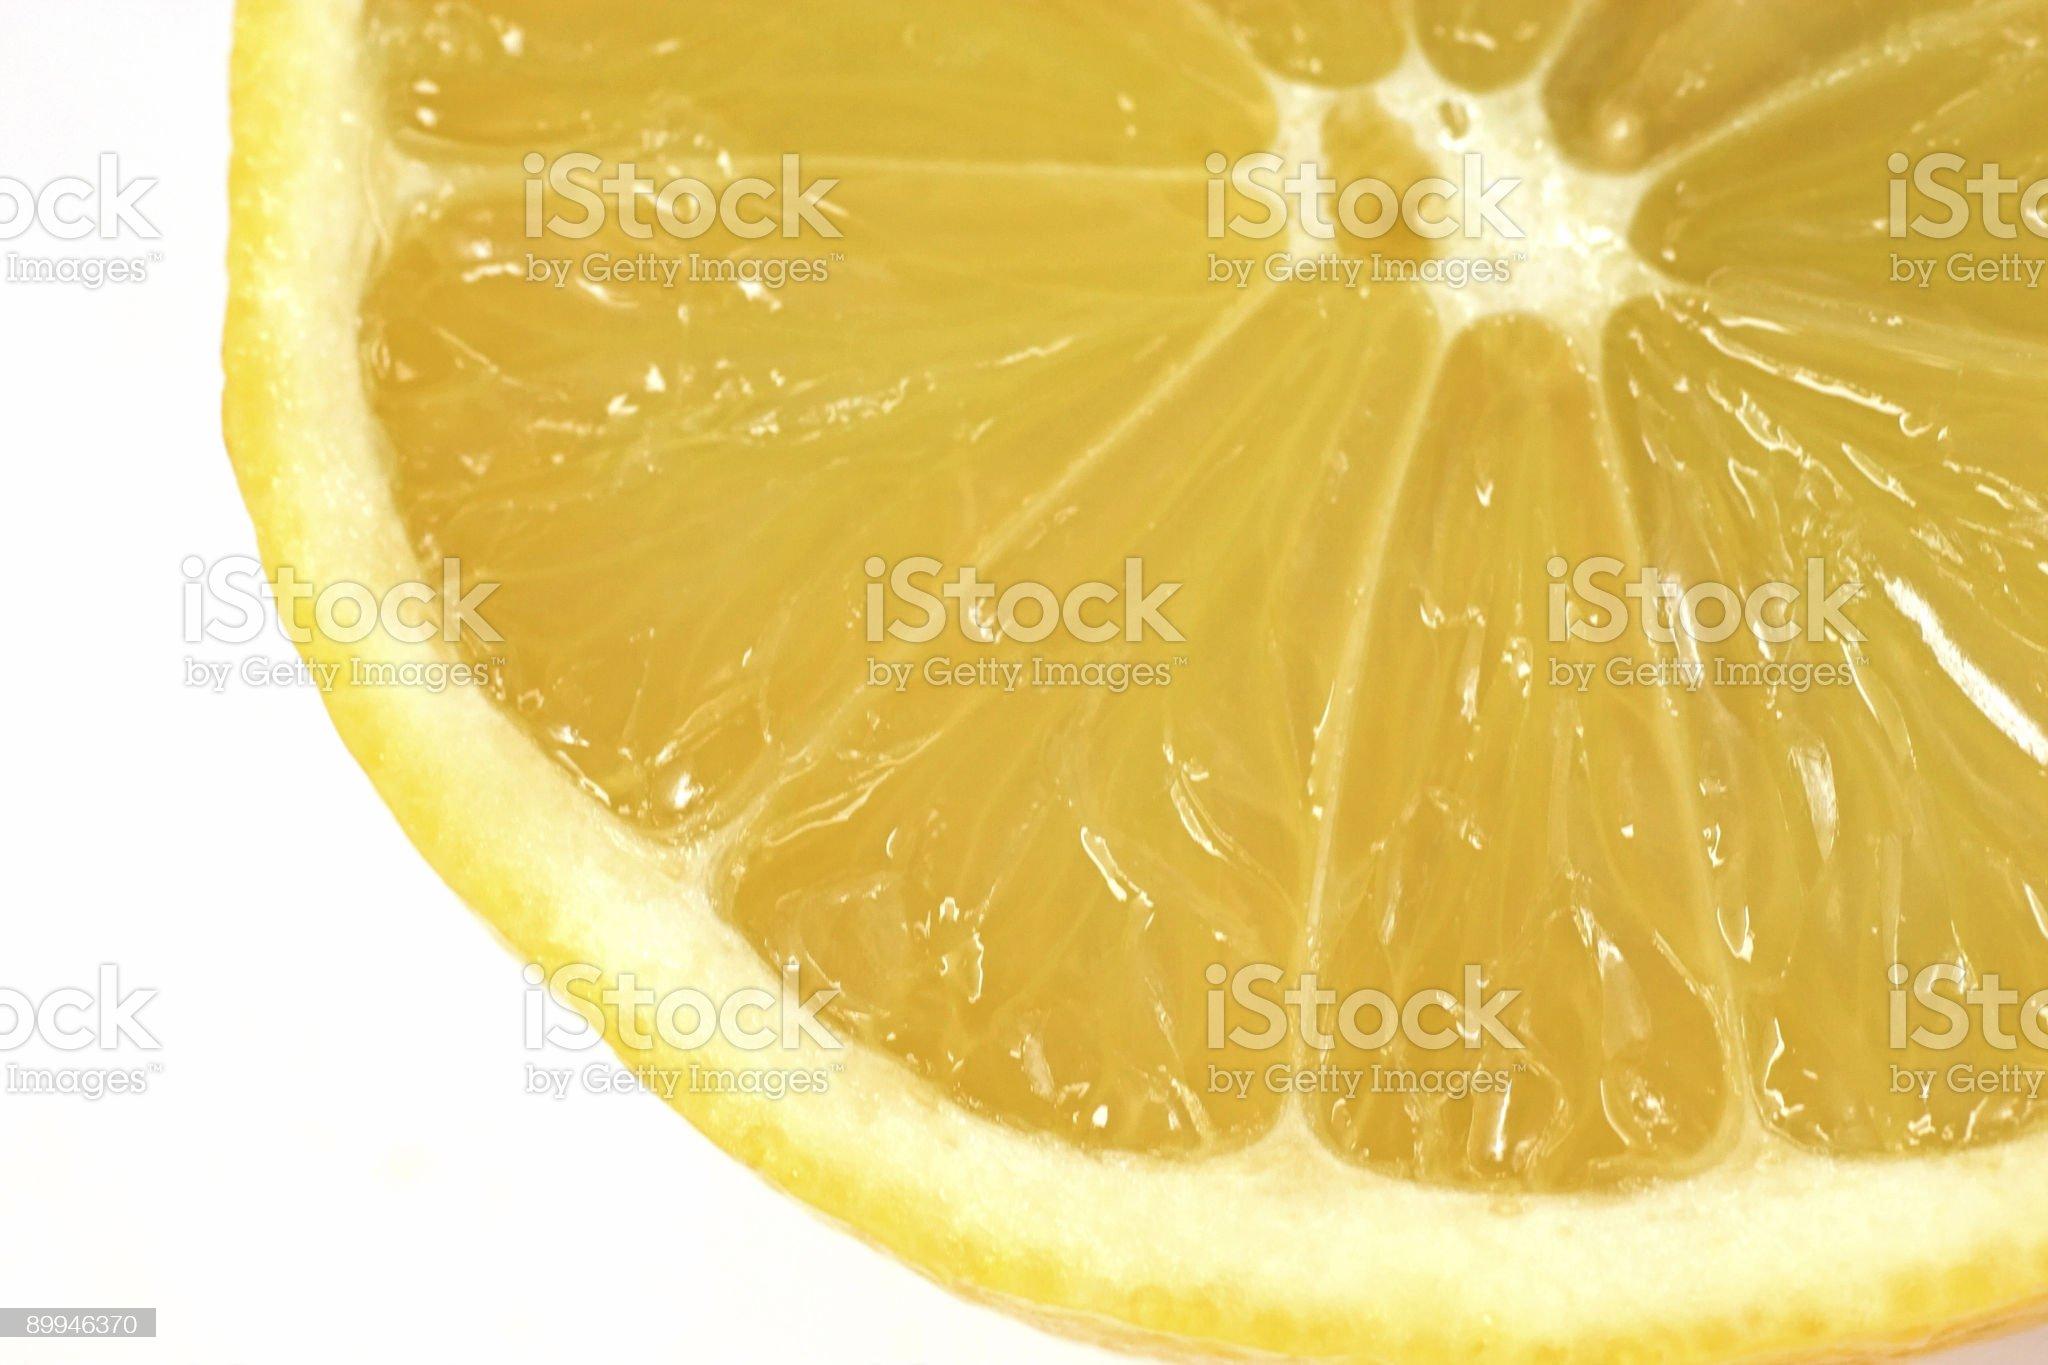 Lemon detail royalty-free stock photo